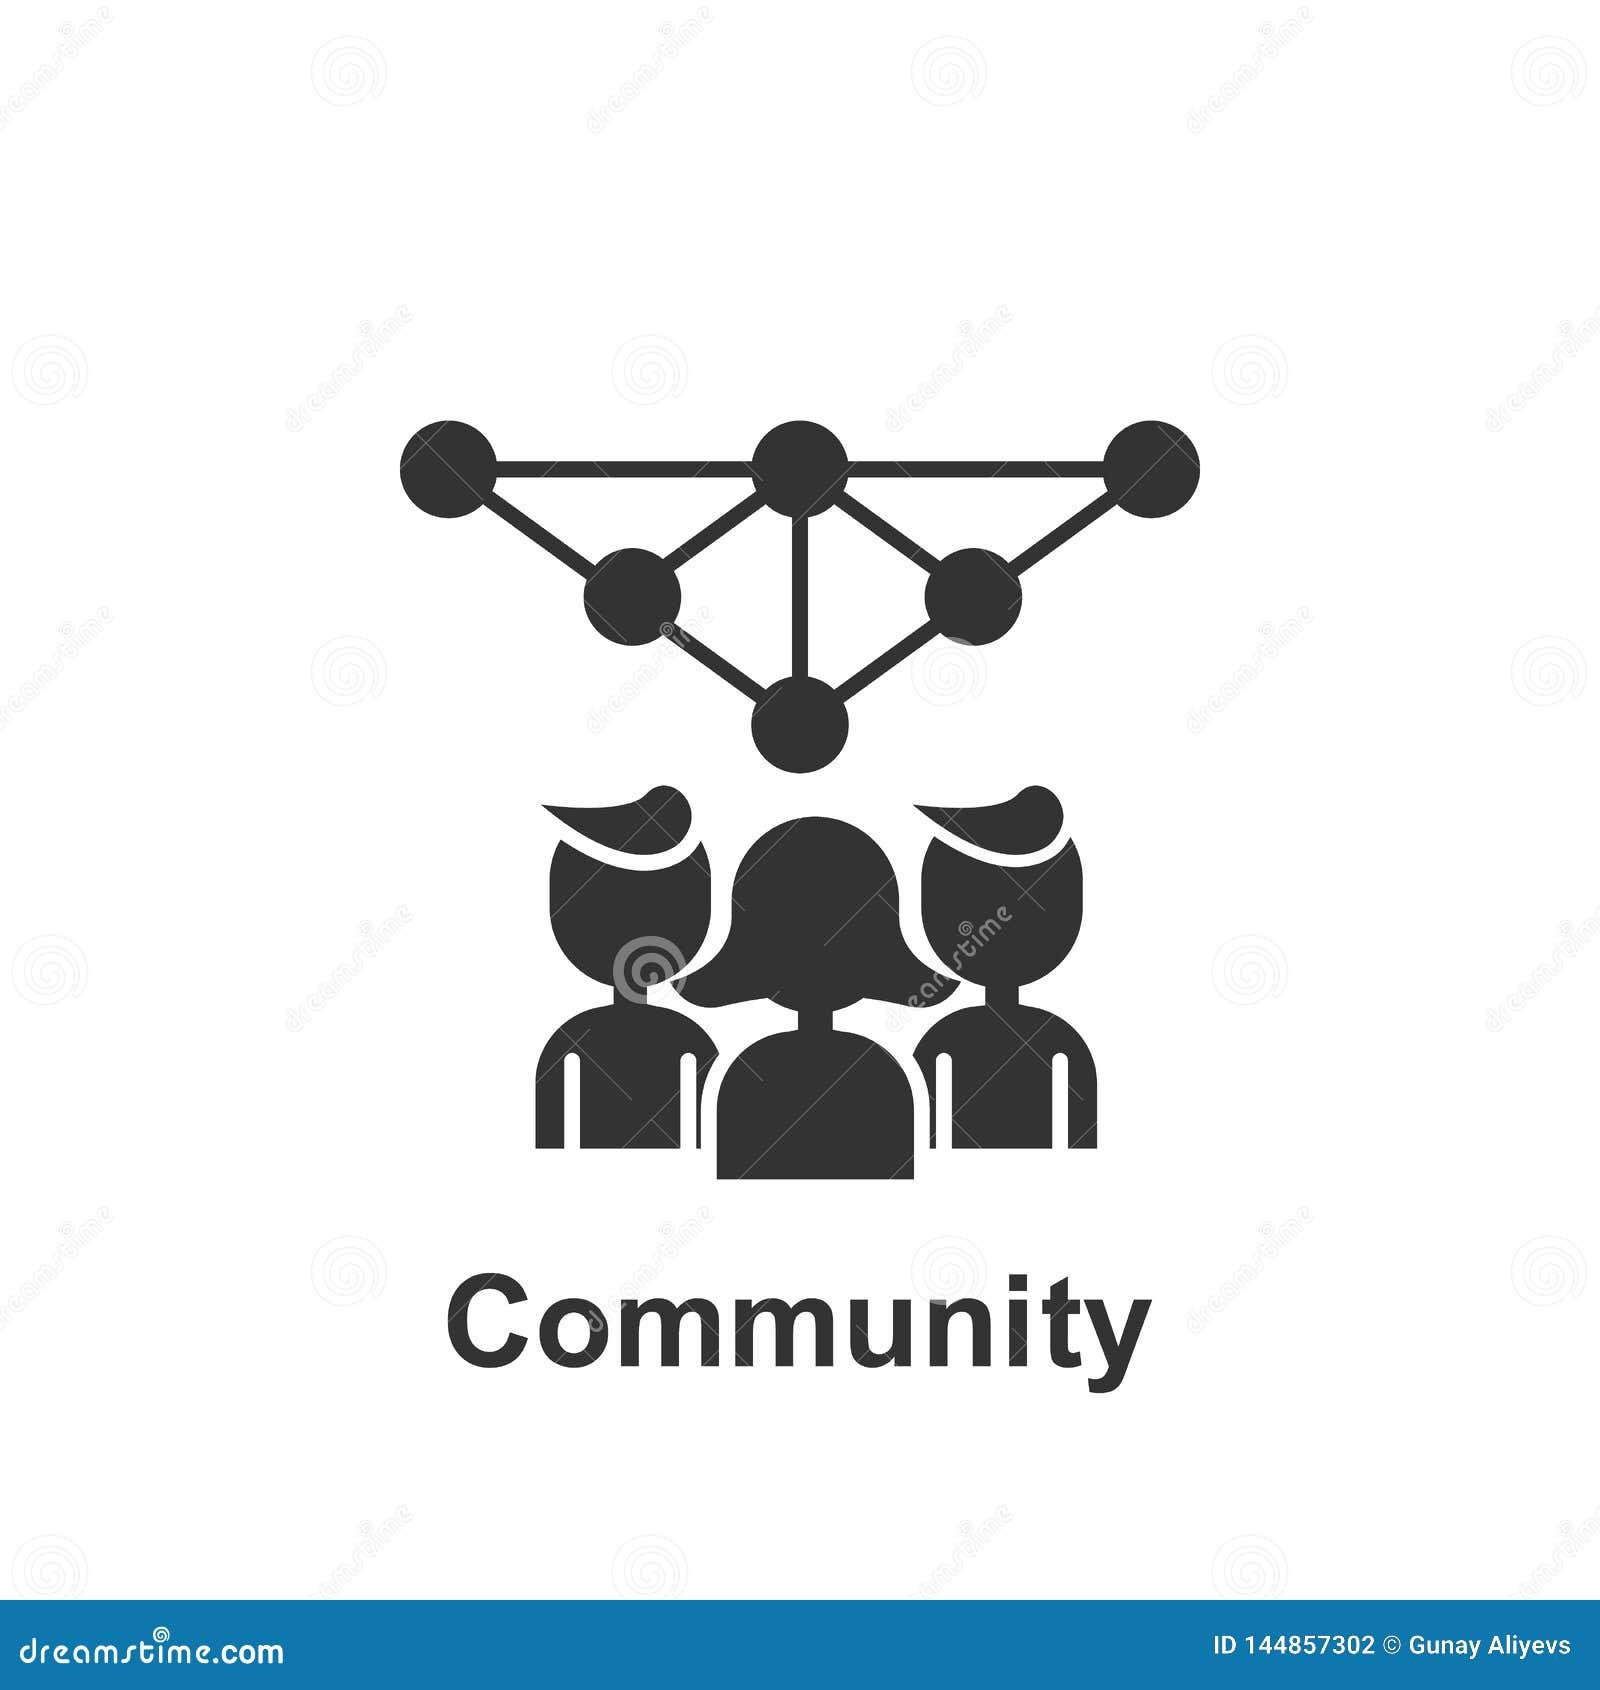 Online marketing, community icon. Element of online marketing icon. Premium quality graphic design icon. Signs and symbols